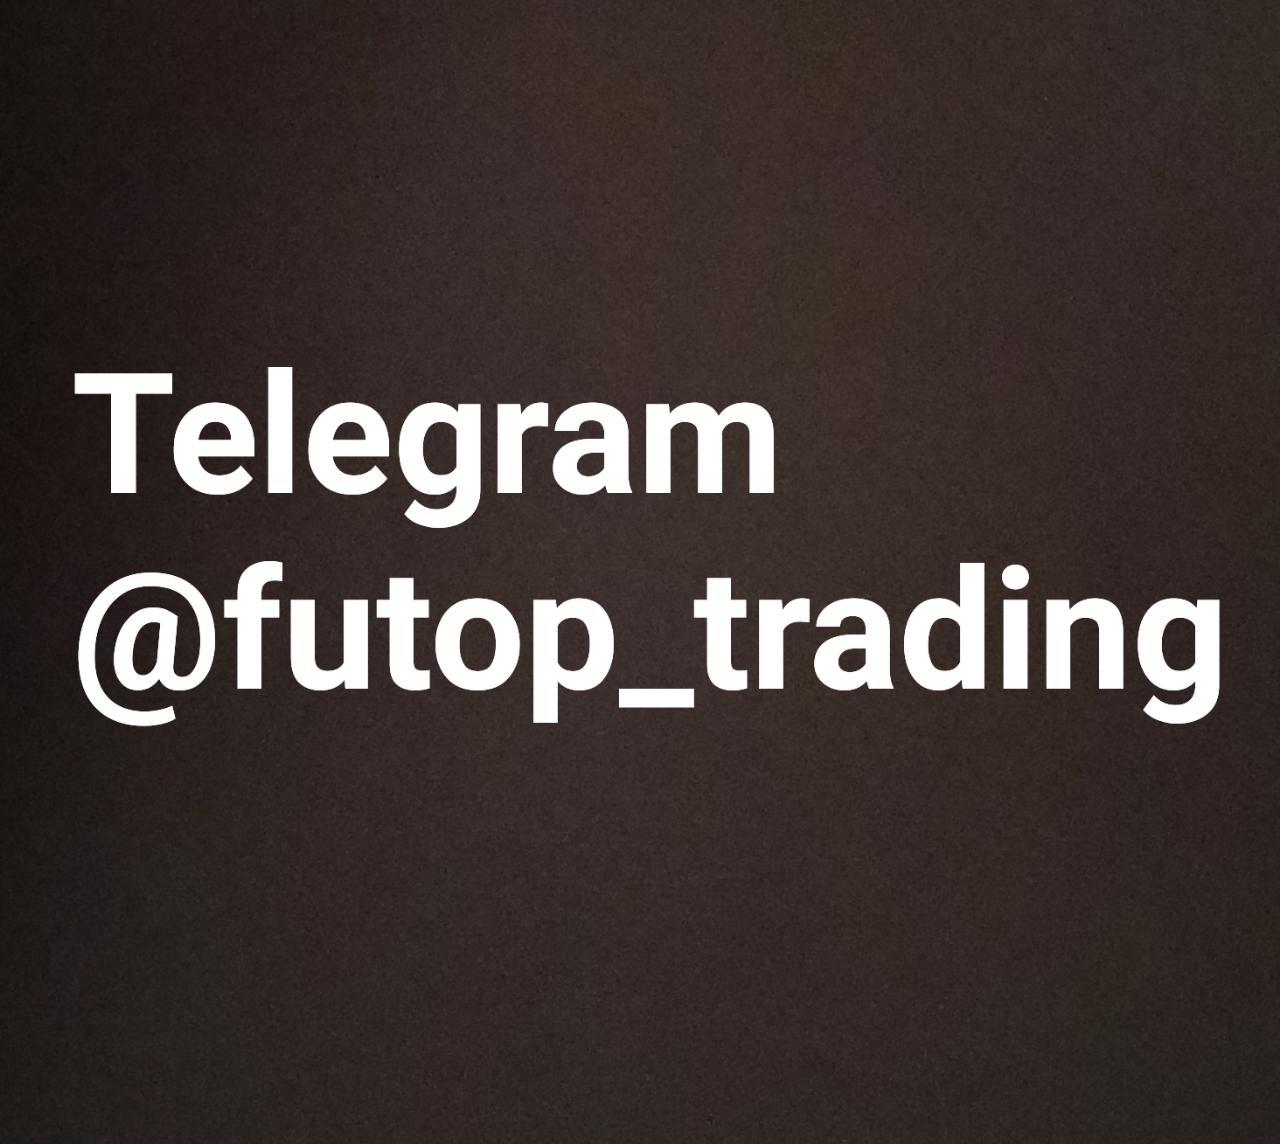 Telegram_Futop_Trading